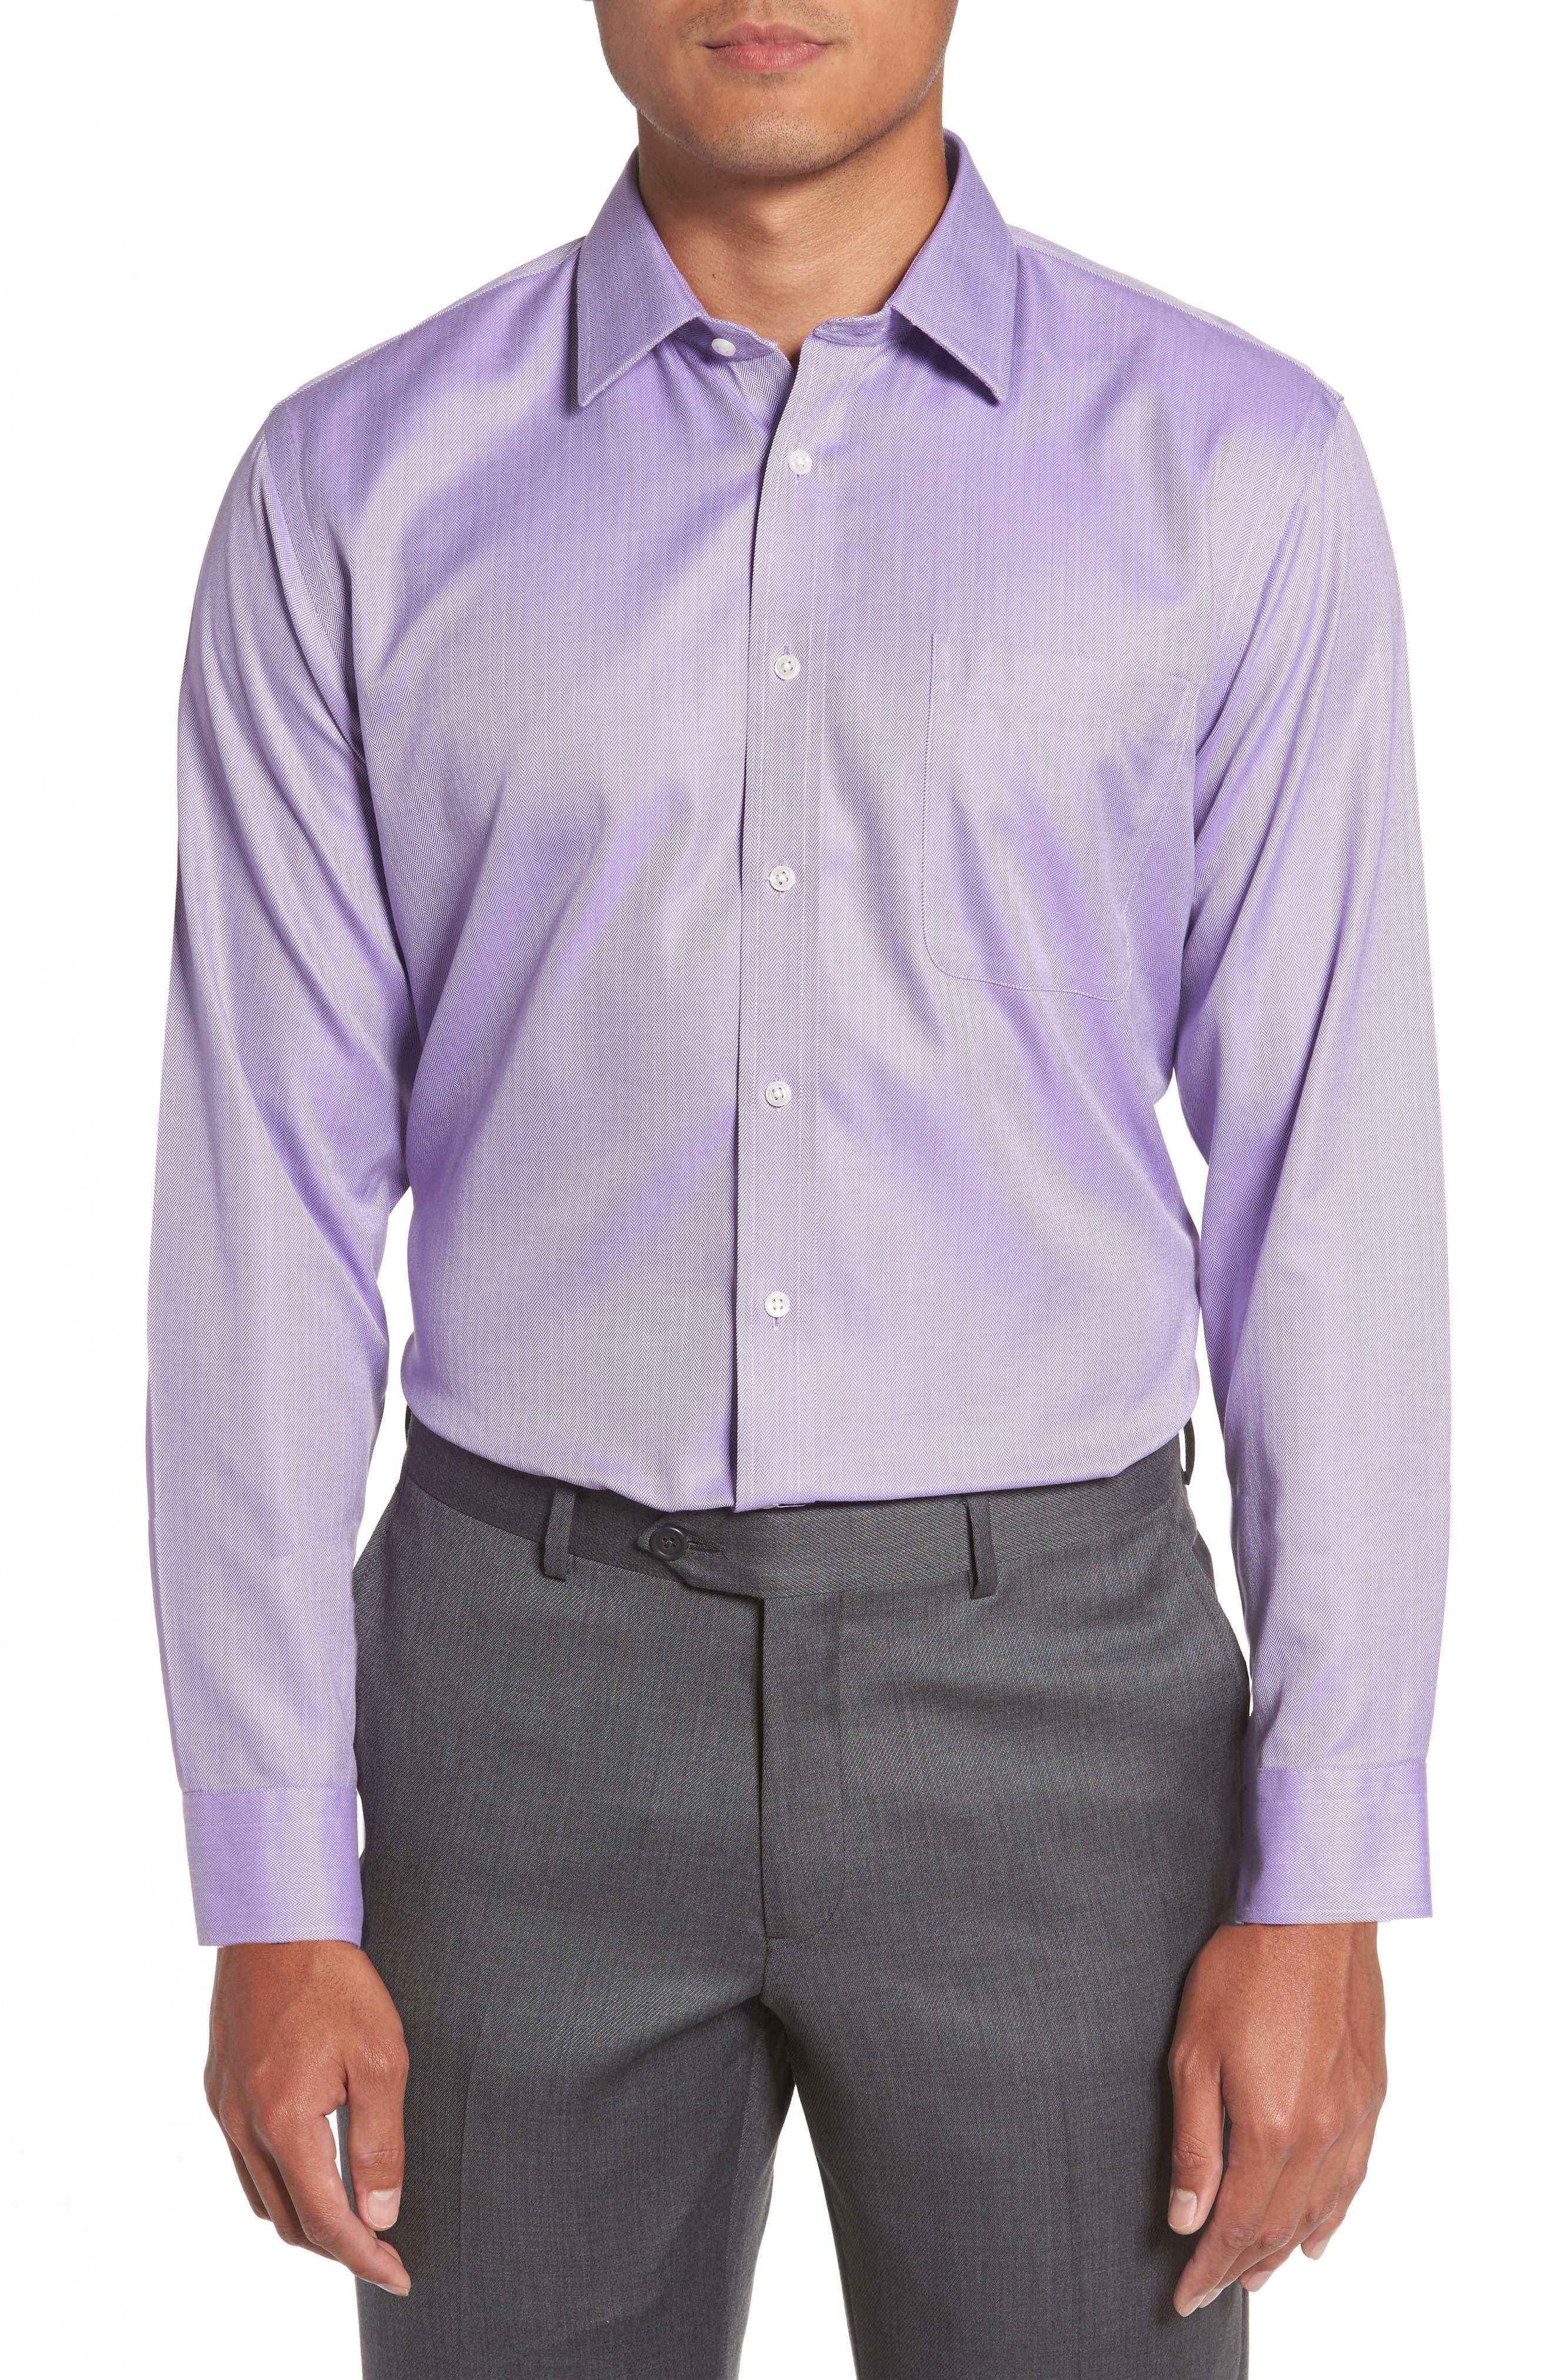 Smartcare<sup>™</sup> Trim Fit Herringbone Dress Shirt,                             Alternate thumbnail 2, color,                             Lavender